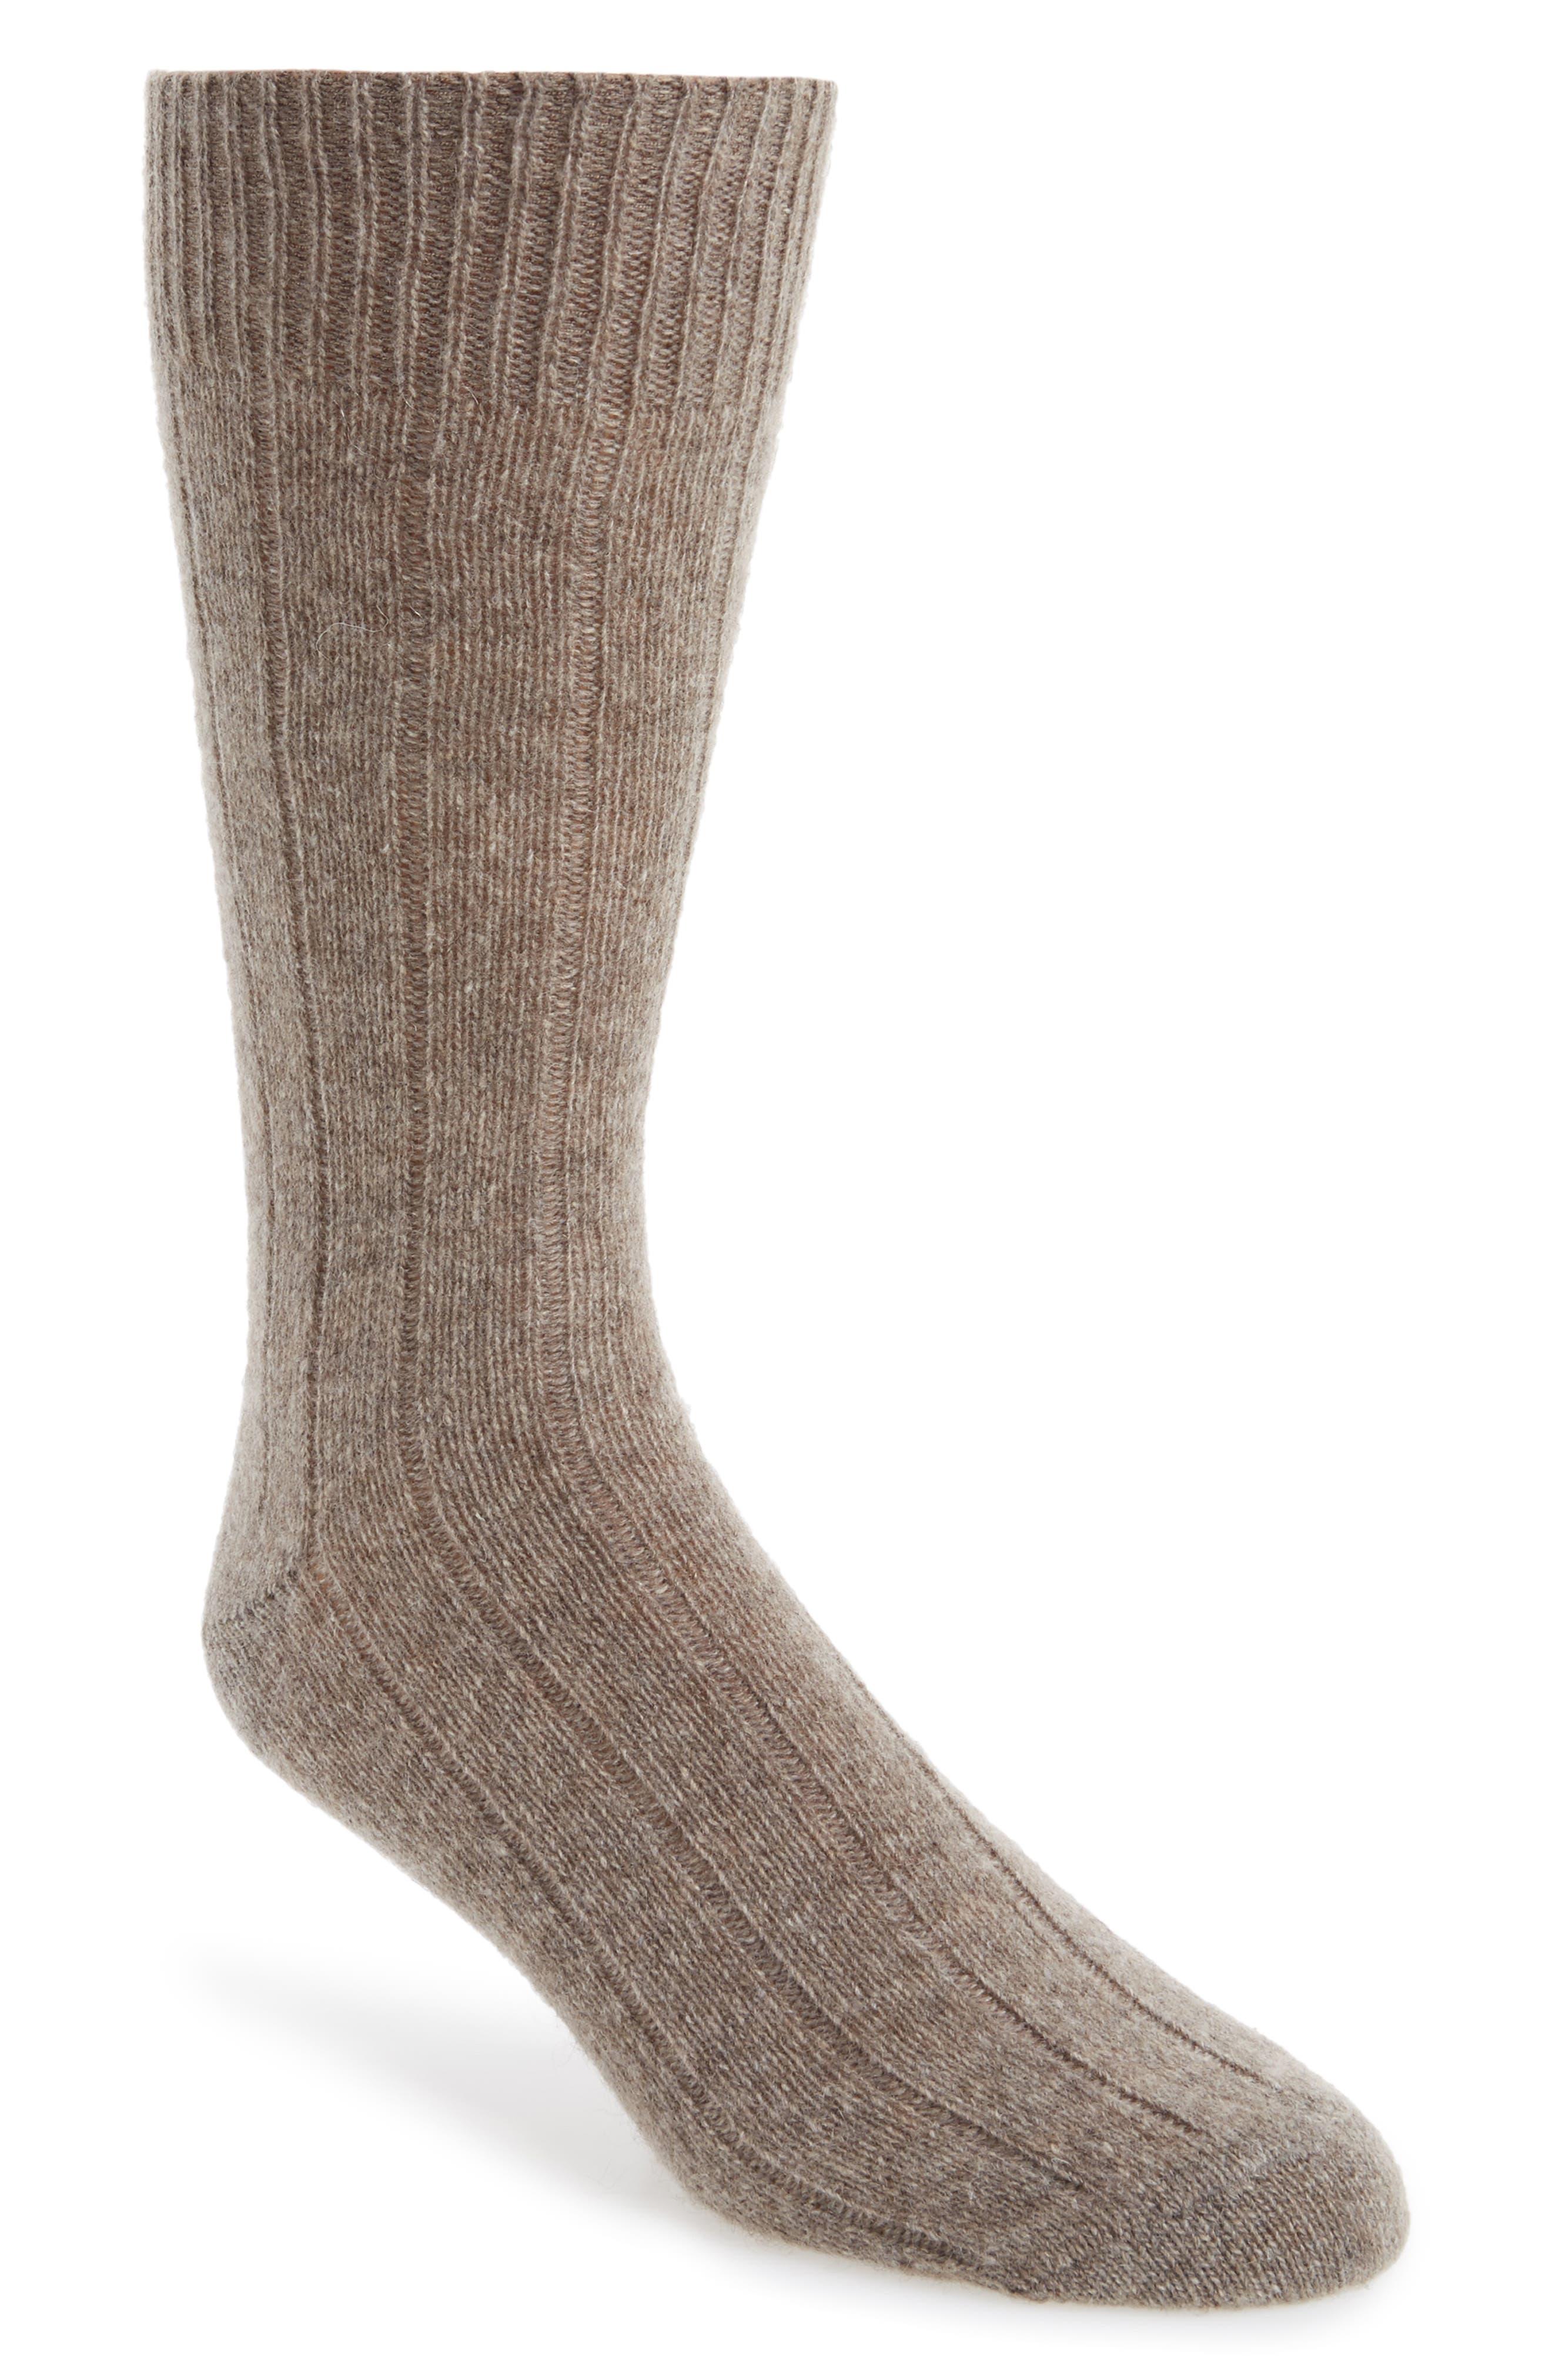 Cashmere Blend Socks,                         Main,                         color, Oatmeal Heather